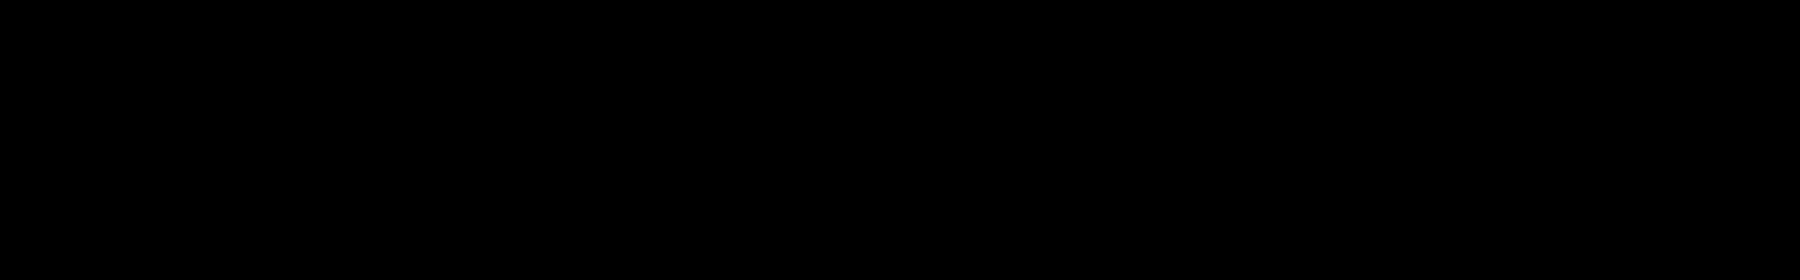 Gora audio waveform